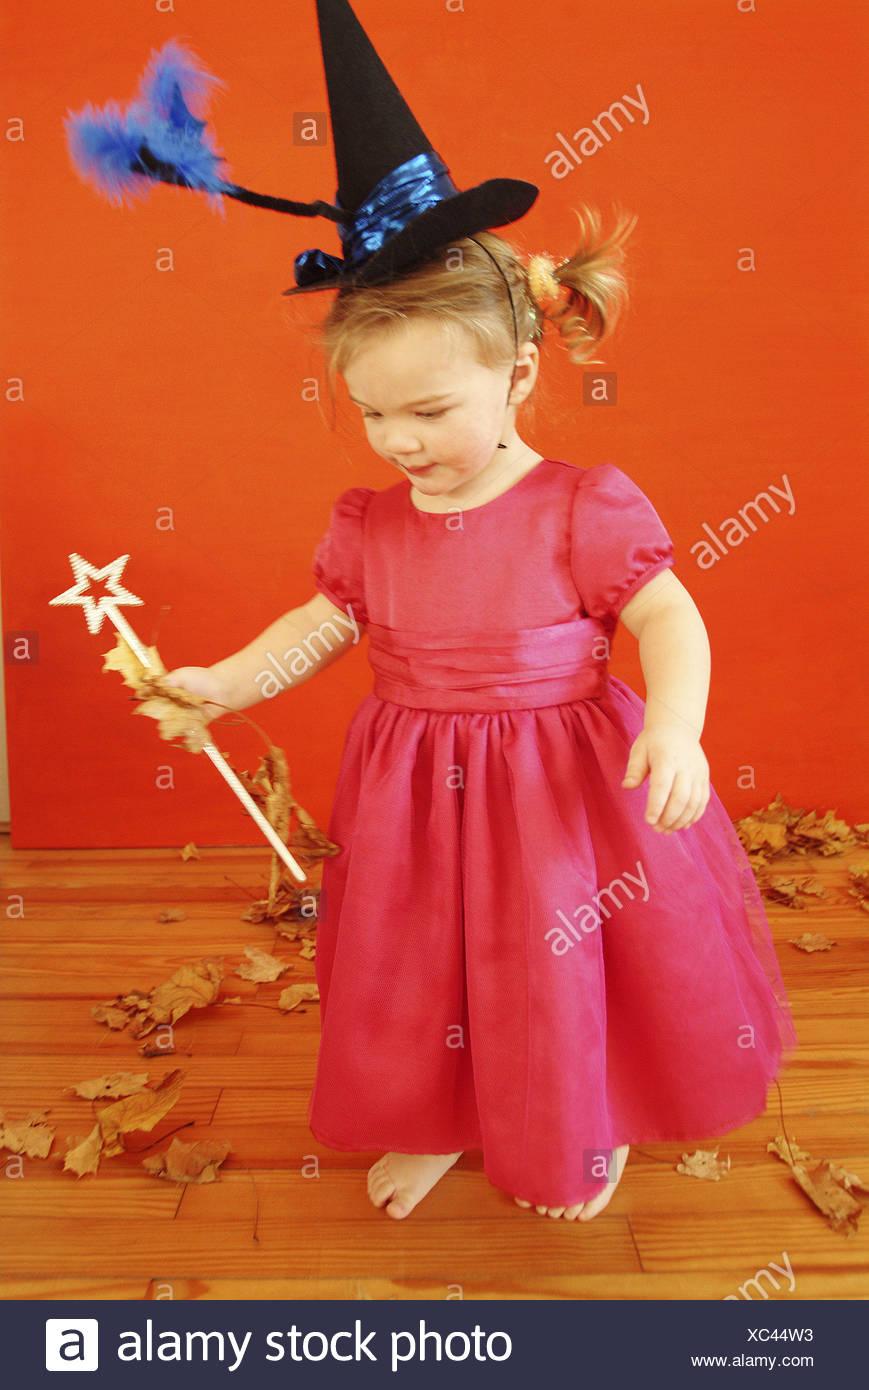 4 People Halloween Costumes Girls.Halloween Child Girls Dress Pink Witch Hat Magic Wand Small